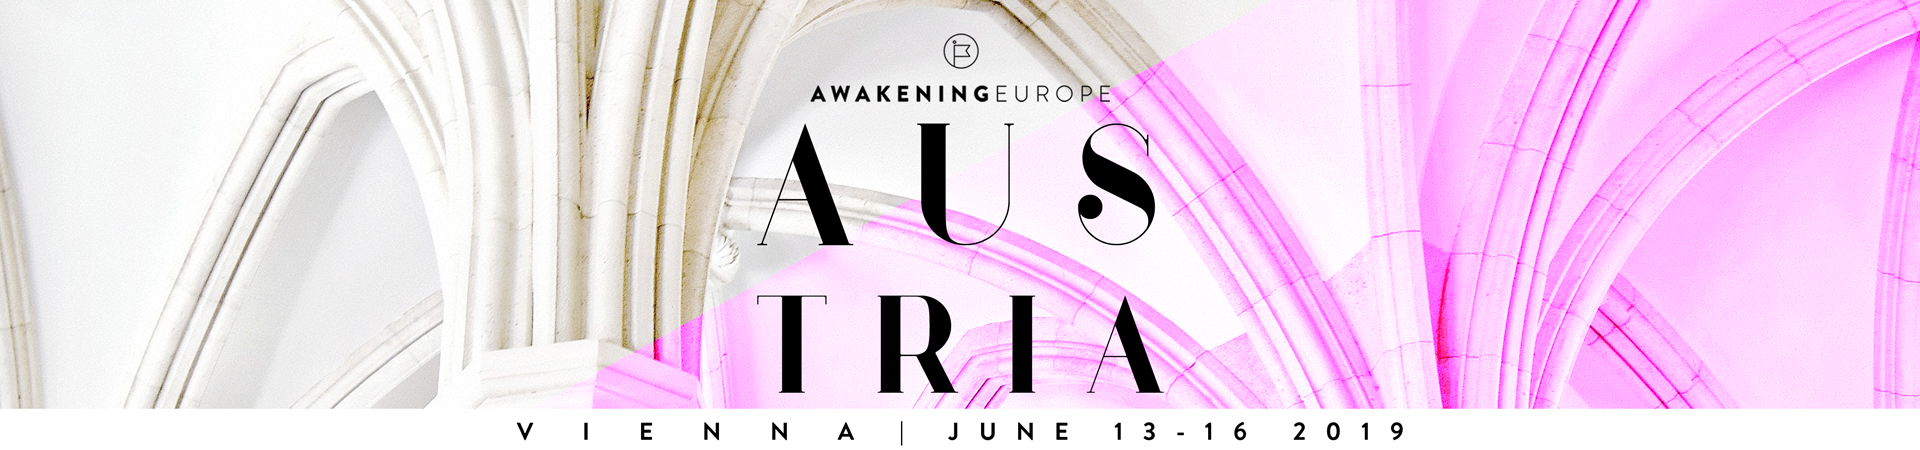 awakening-austria_widescreen